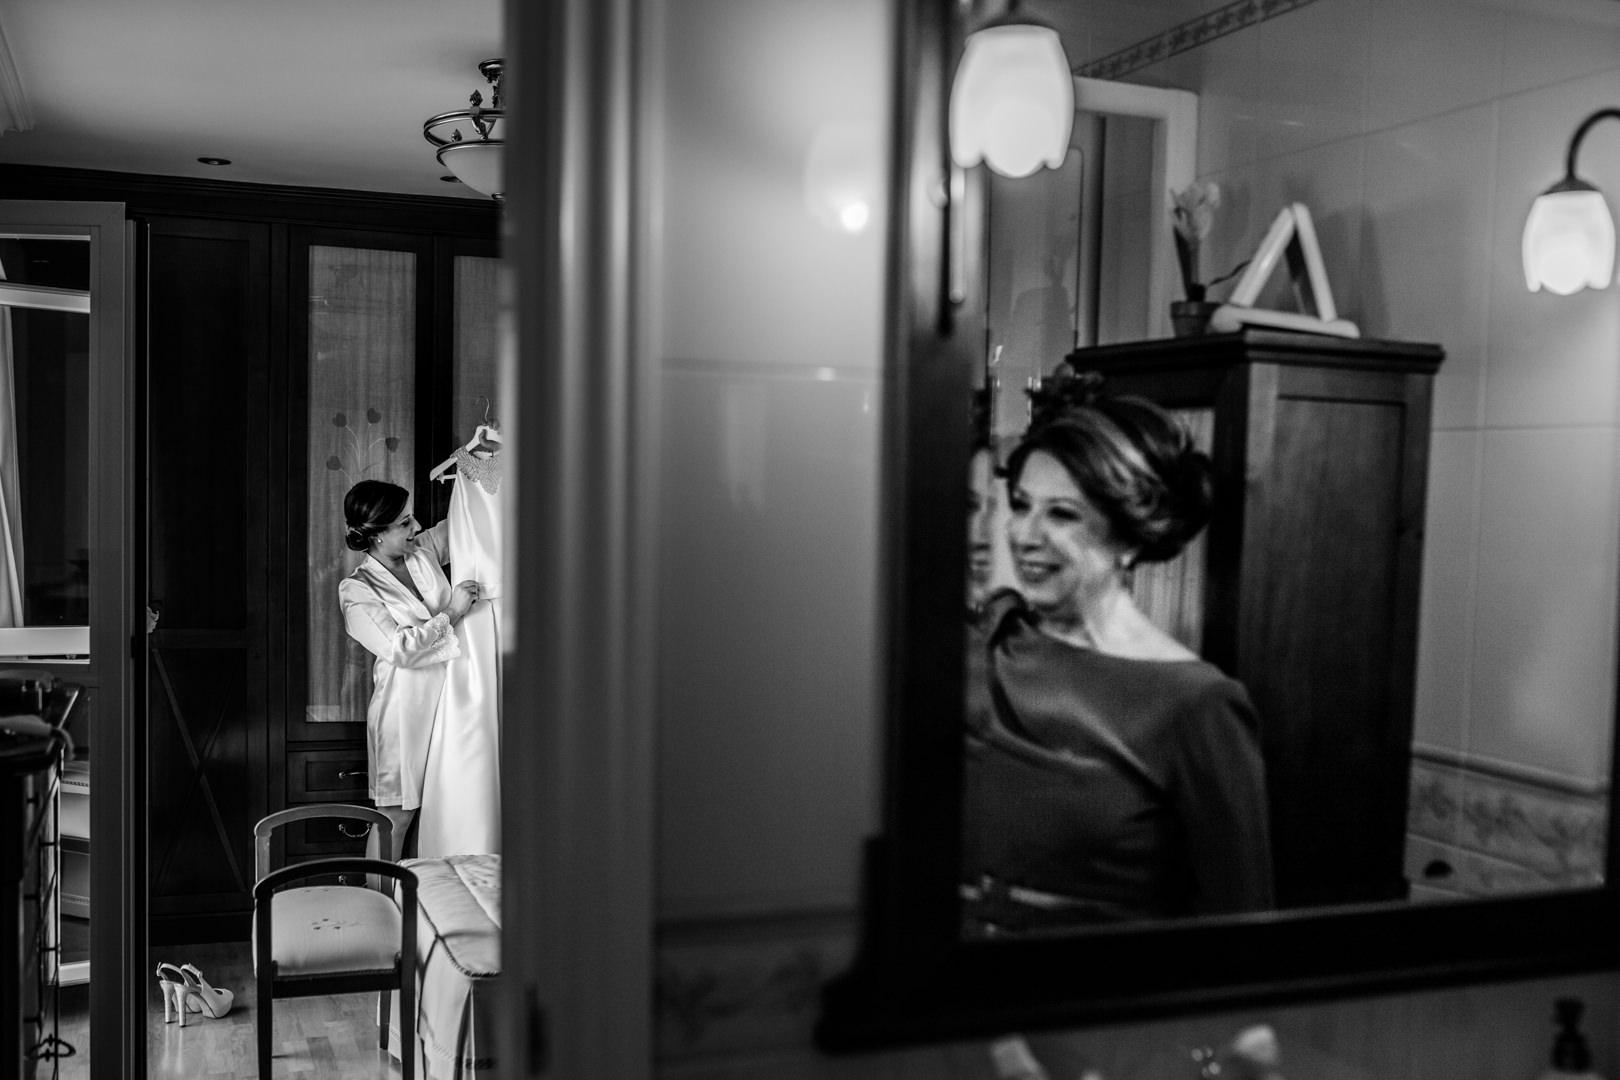 Boda-Catedral-Jaen-Hamburgo-Maria-David-engagement-Rafael-Torres-fotografo-bodas-sevilla-madrid-barcelona-wedding-photographer--13.jpg